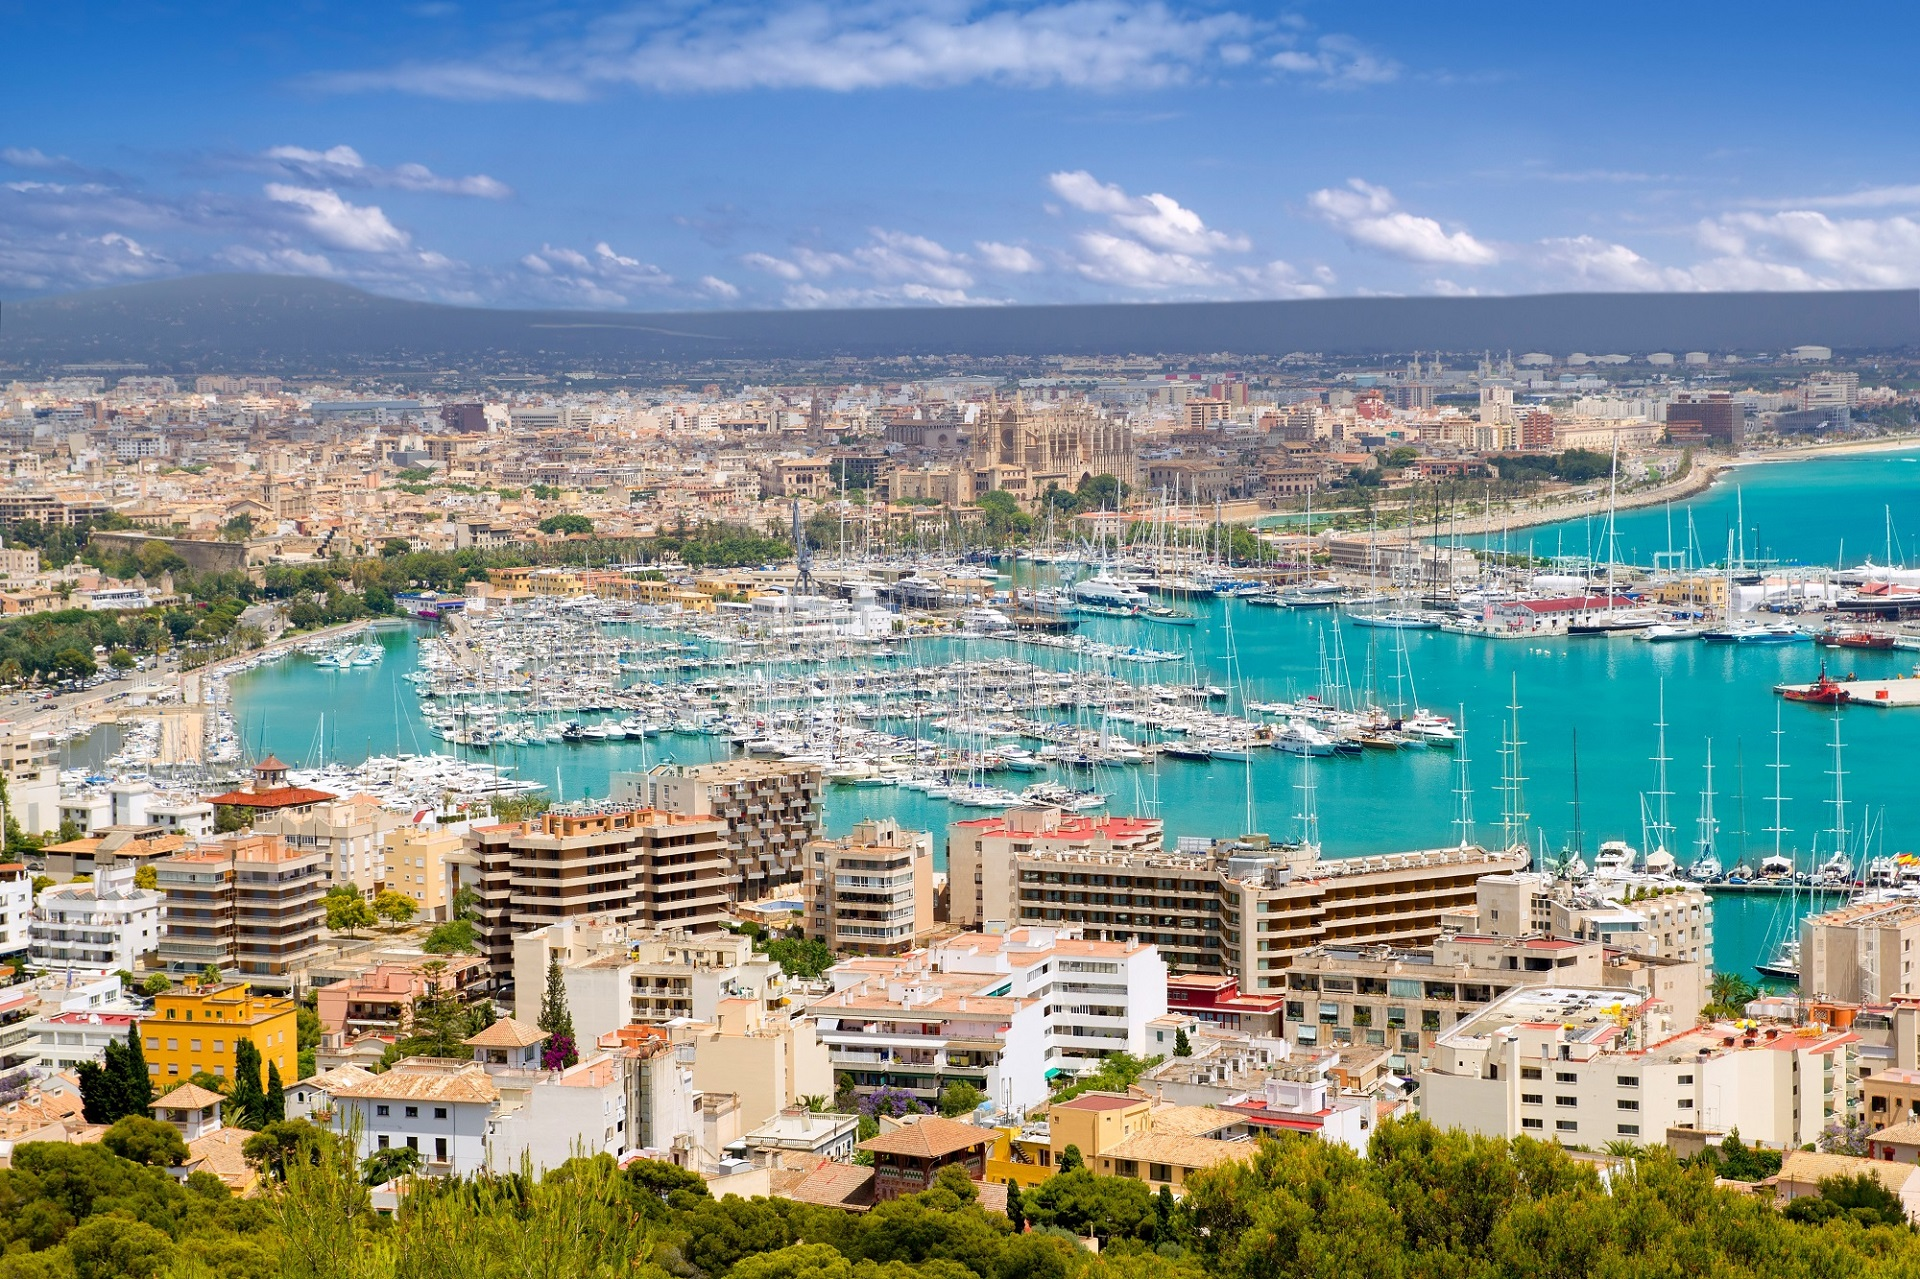 Blick von oben auf Palma de Mallorca.